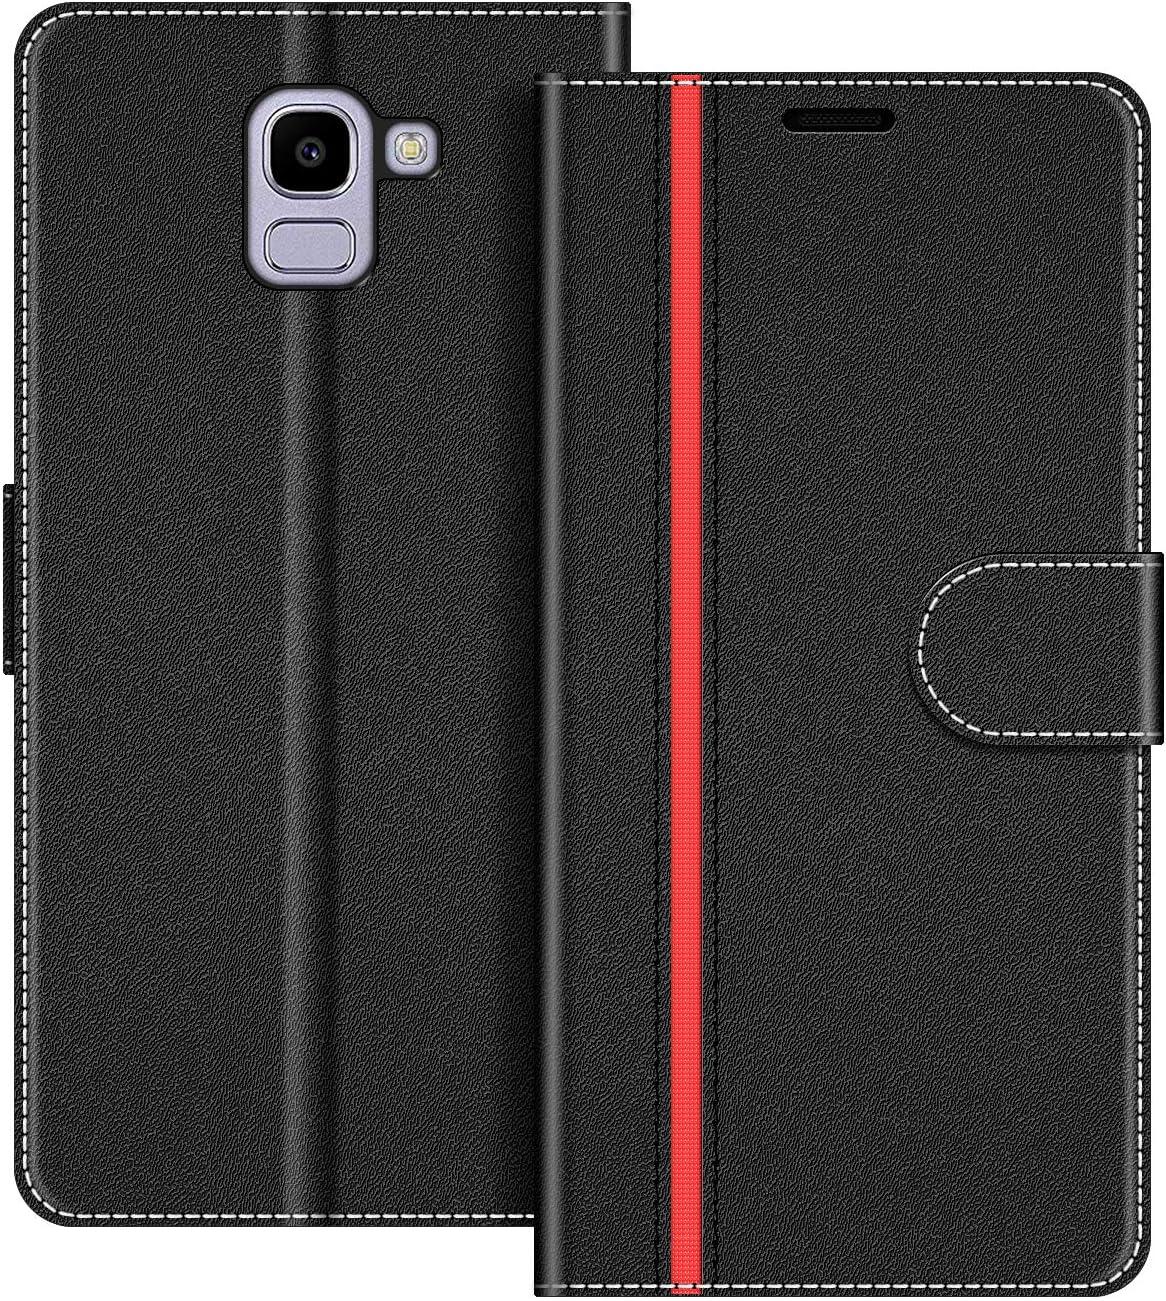 COODIO Funda Samsung Galaxy J6 2018 con Tapa, Funda Movil Samsung J6 2018, Funda Libro Galaxy J6 2018 Carcasa Magnético Funda para Samsung Galaxy J6 2018, Negro/Rojo